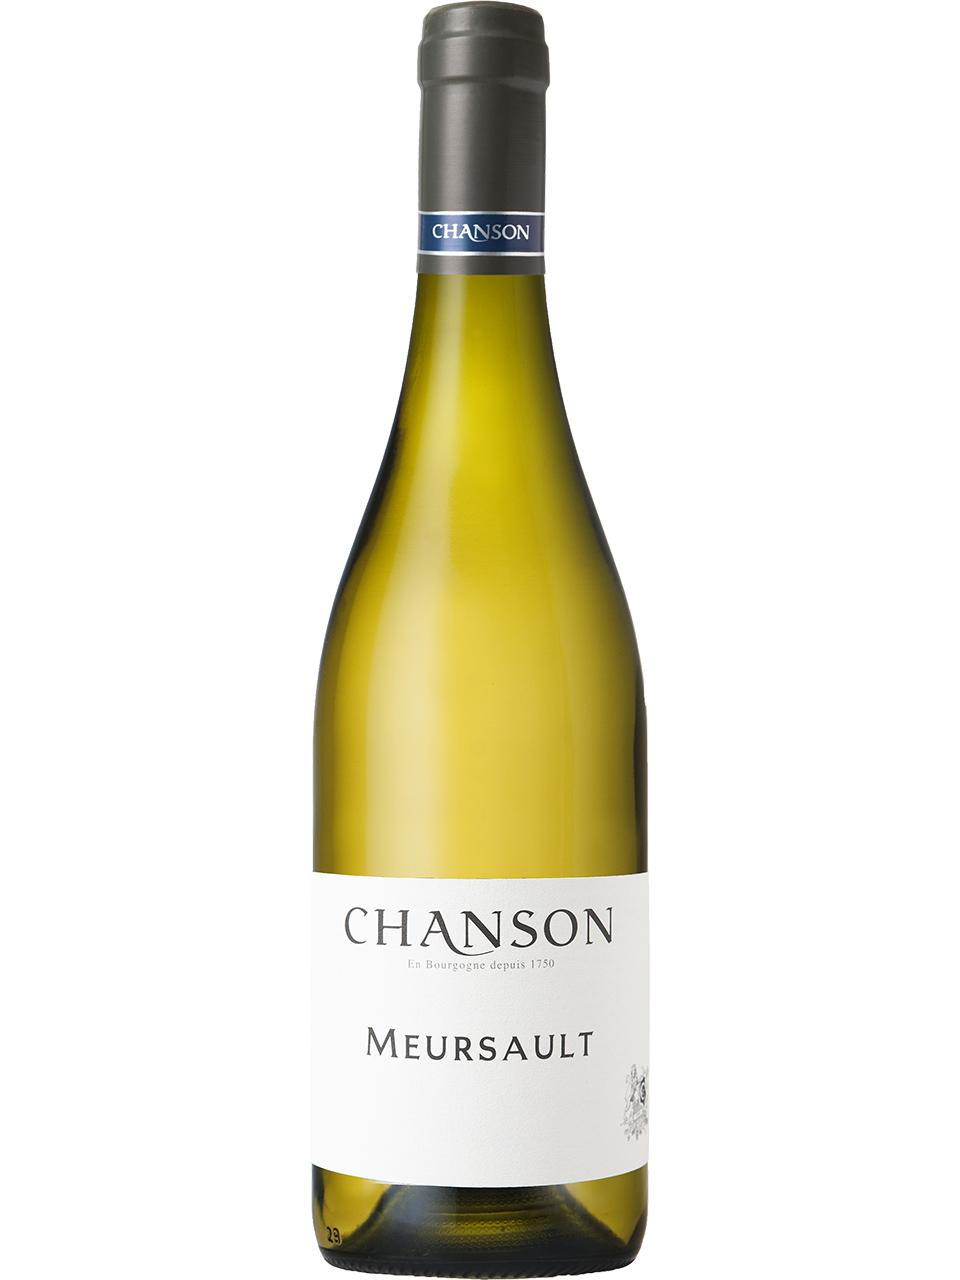 Chanson Meursault